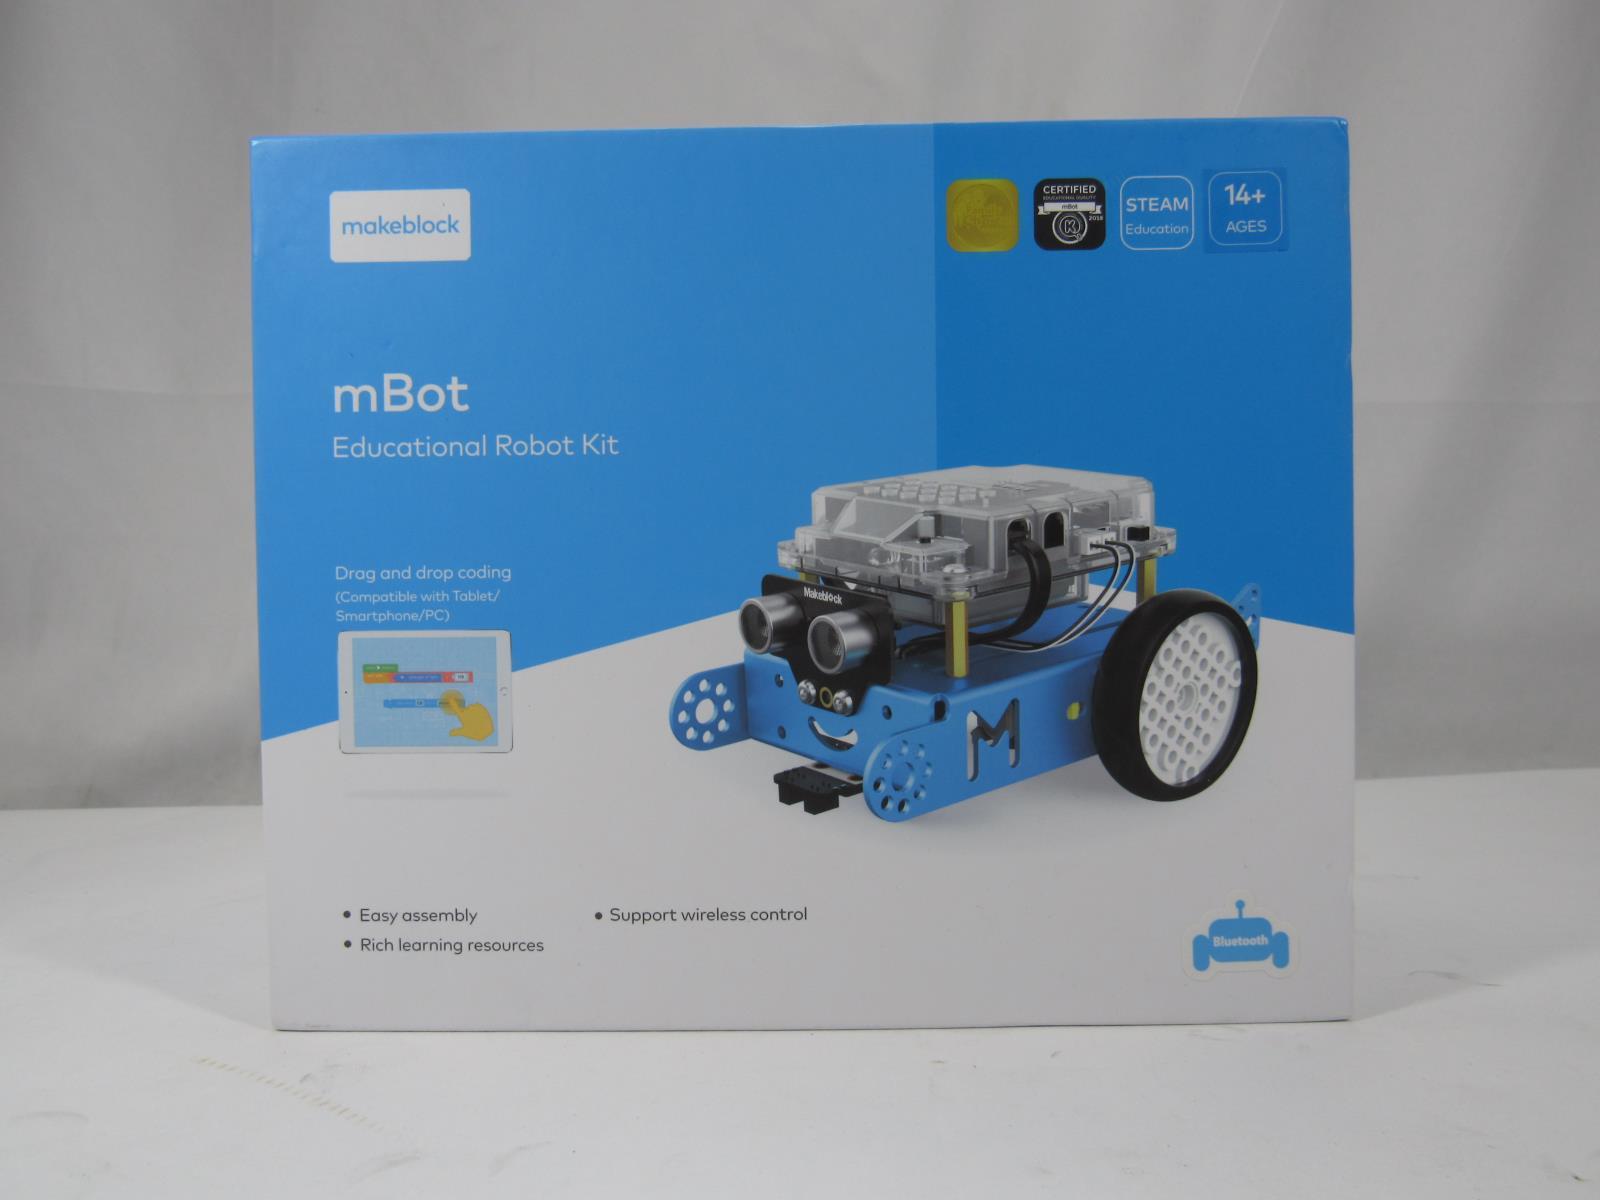 Details about New Makeblock mBot Education STEM Robot Kit Bluetooth Version  Blue 689-W101